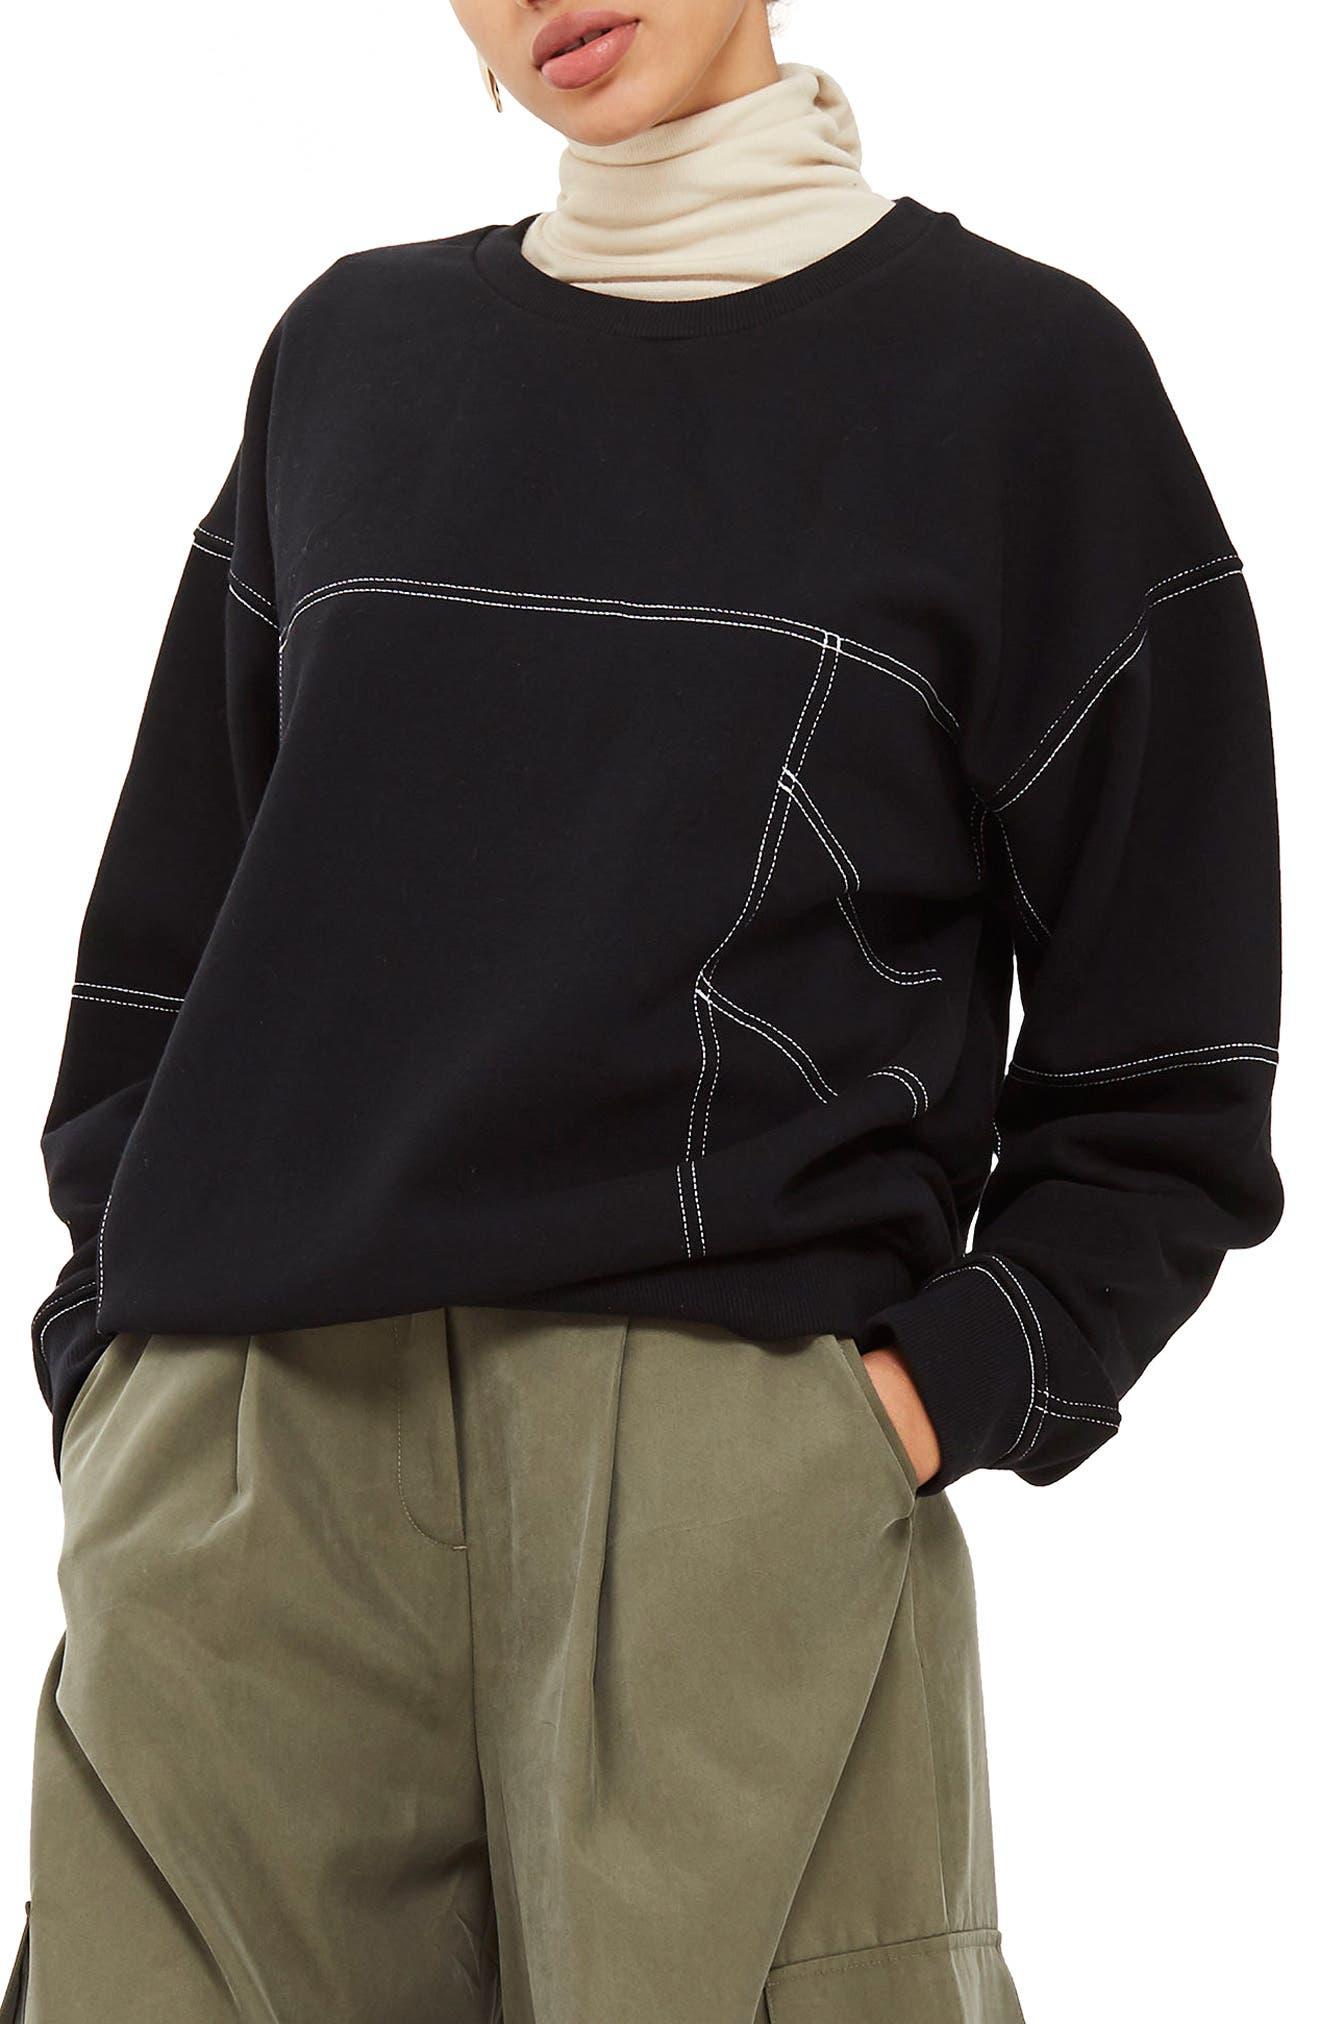 Stab Stitch Detail Sweatshirt,                         Main,                         color, Black